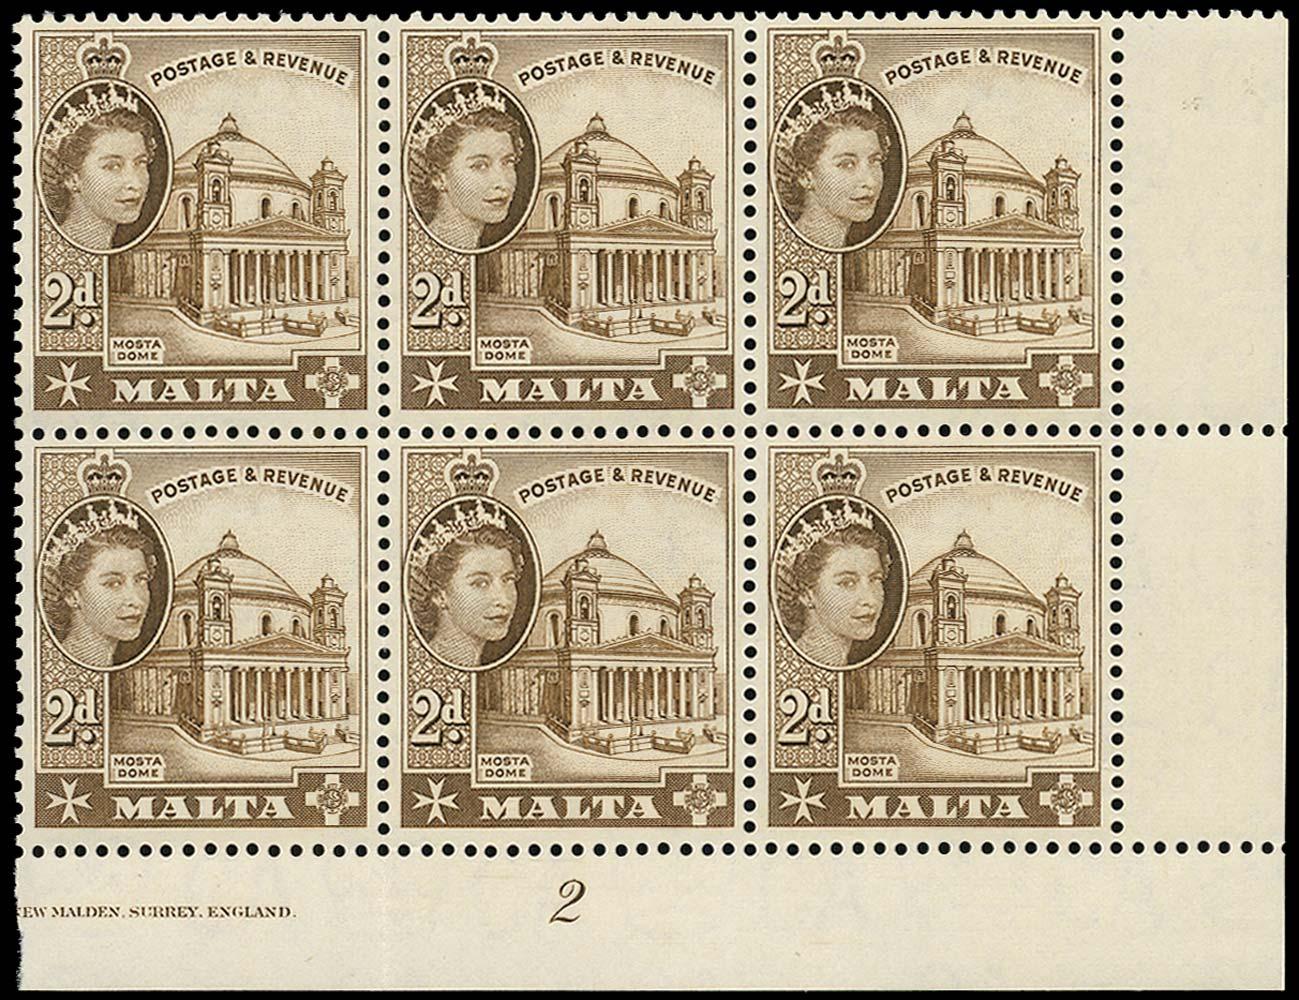 MALTA 1958  SG270a Mint